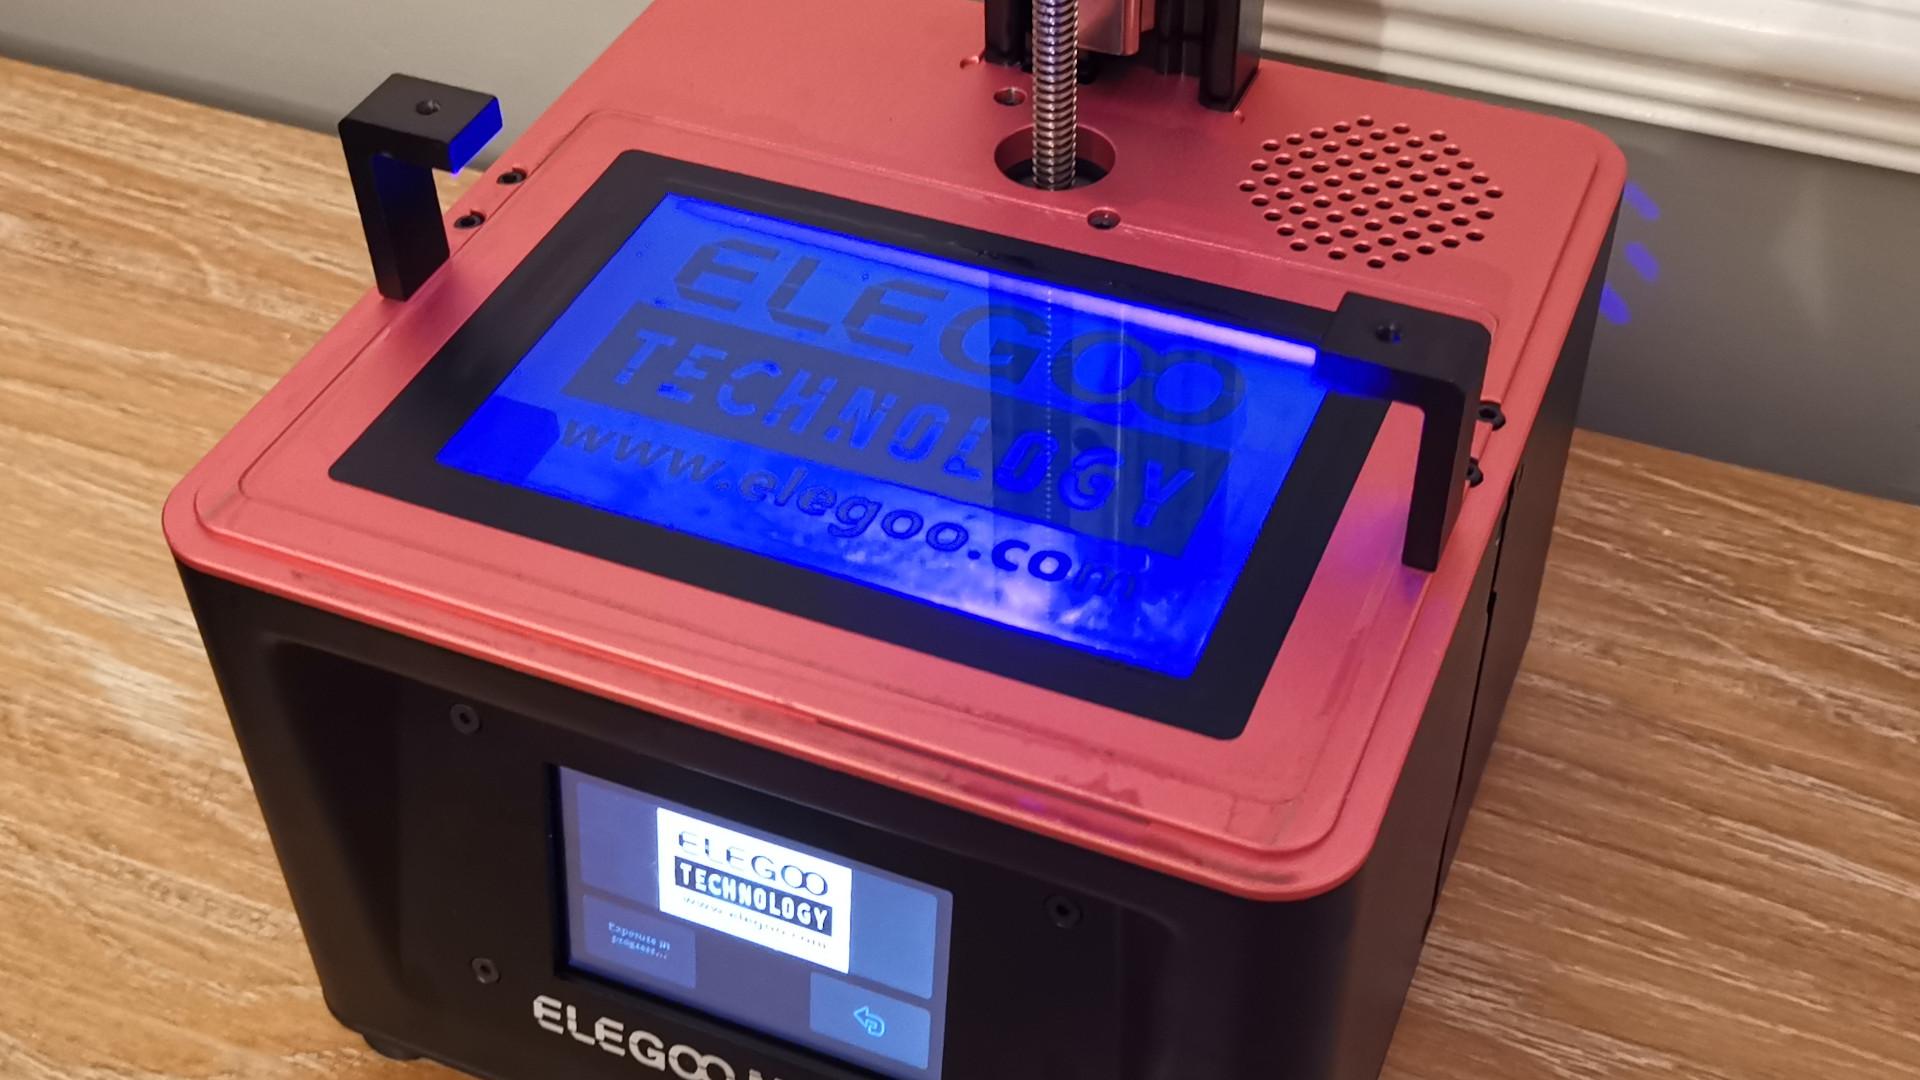 LED screen of the Elegoo Mars 2 Pro